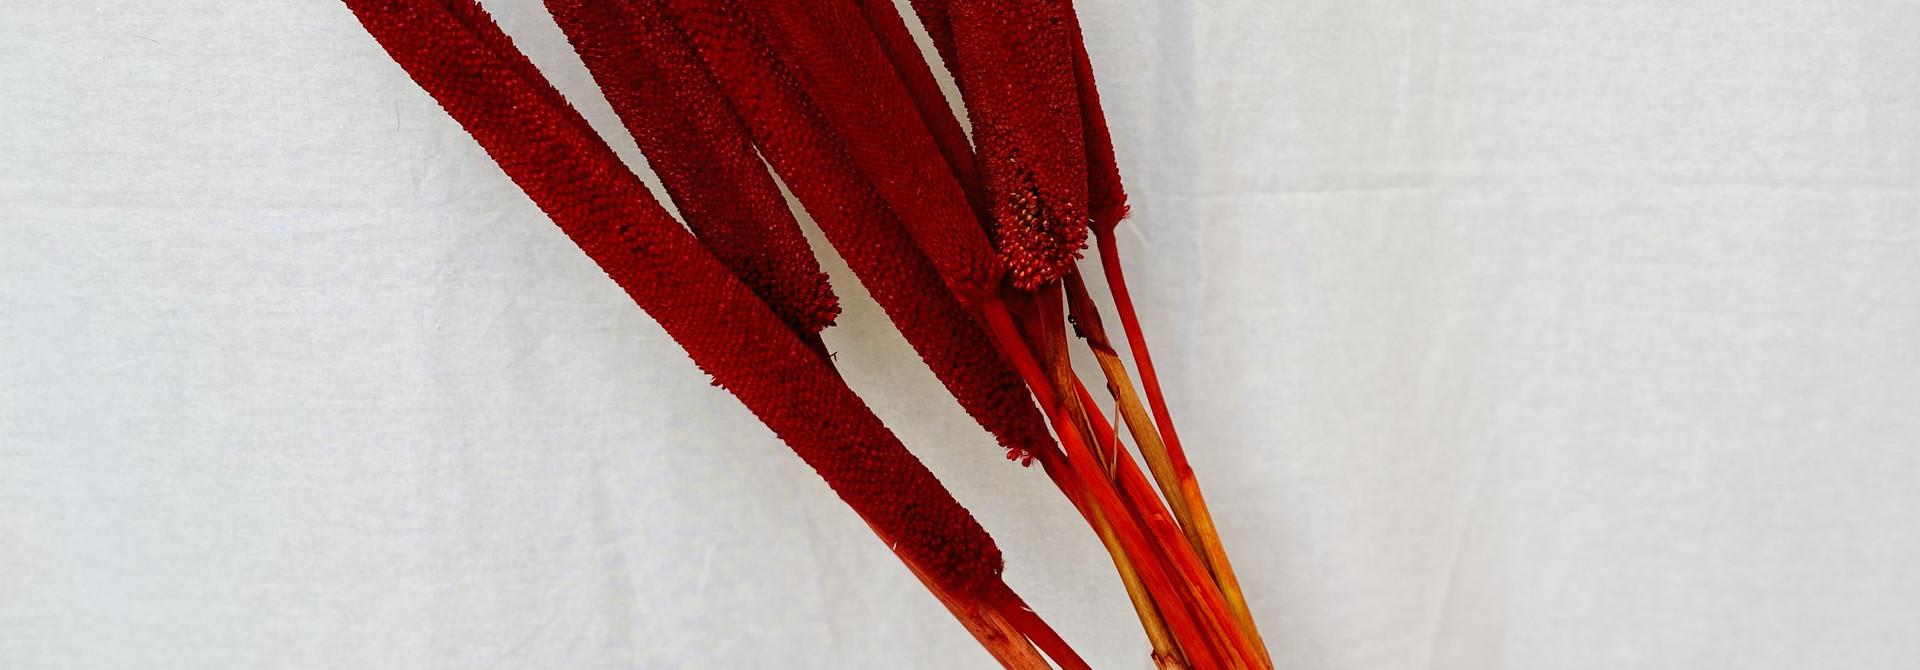 Babala Red - 5 stuks